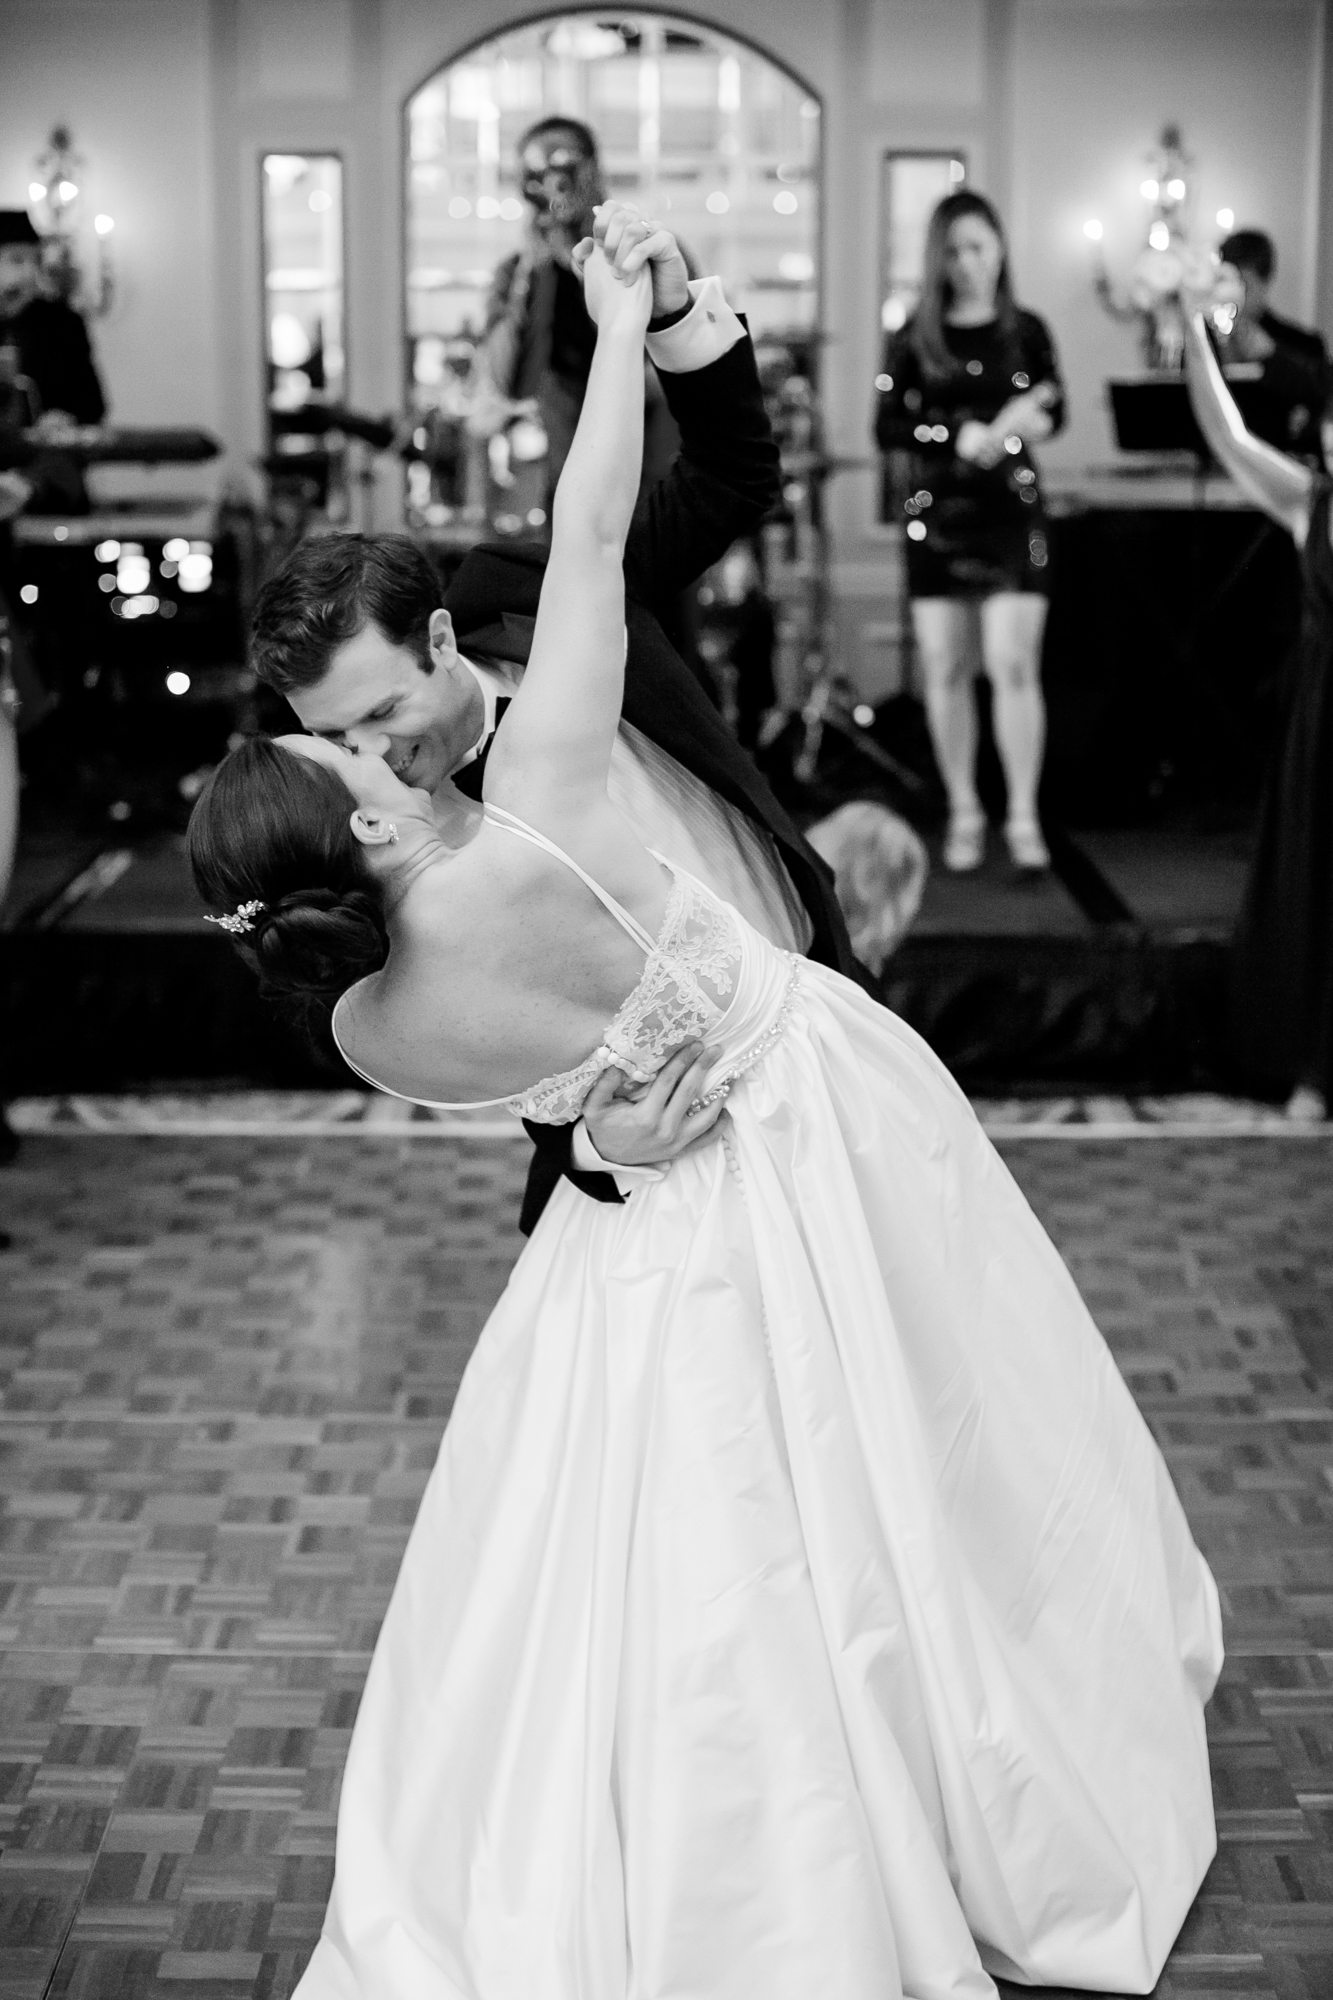 20150321_2015.12.31_MonjePaulson_Wedding_website_IMG_5750 copy.jpg